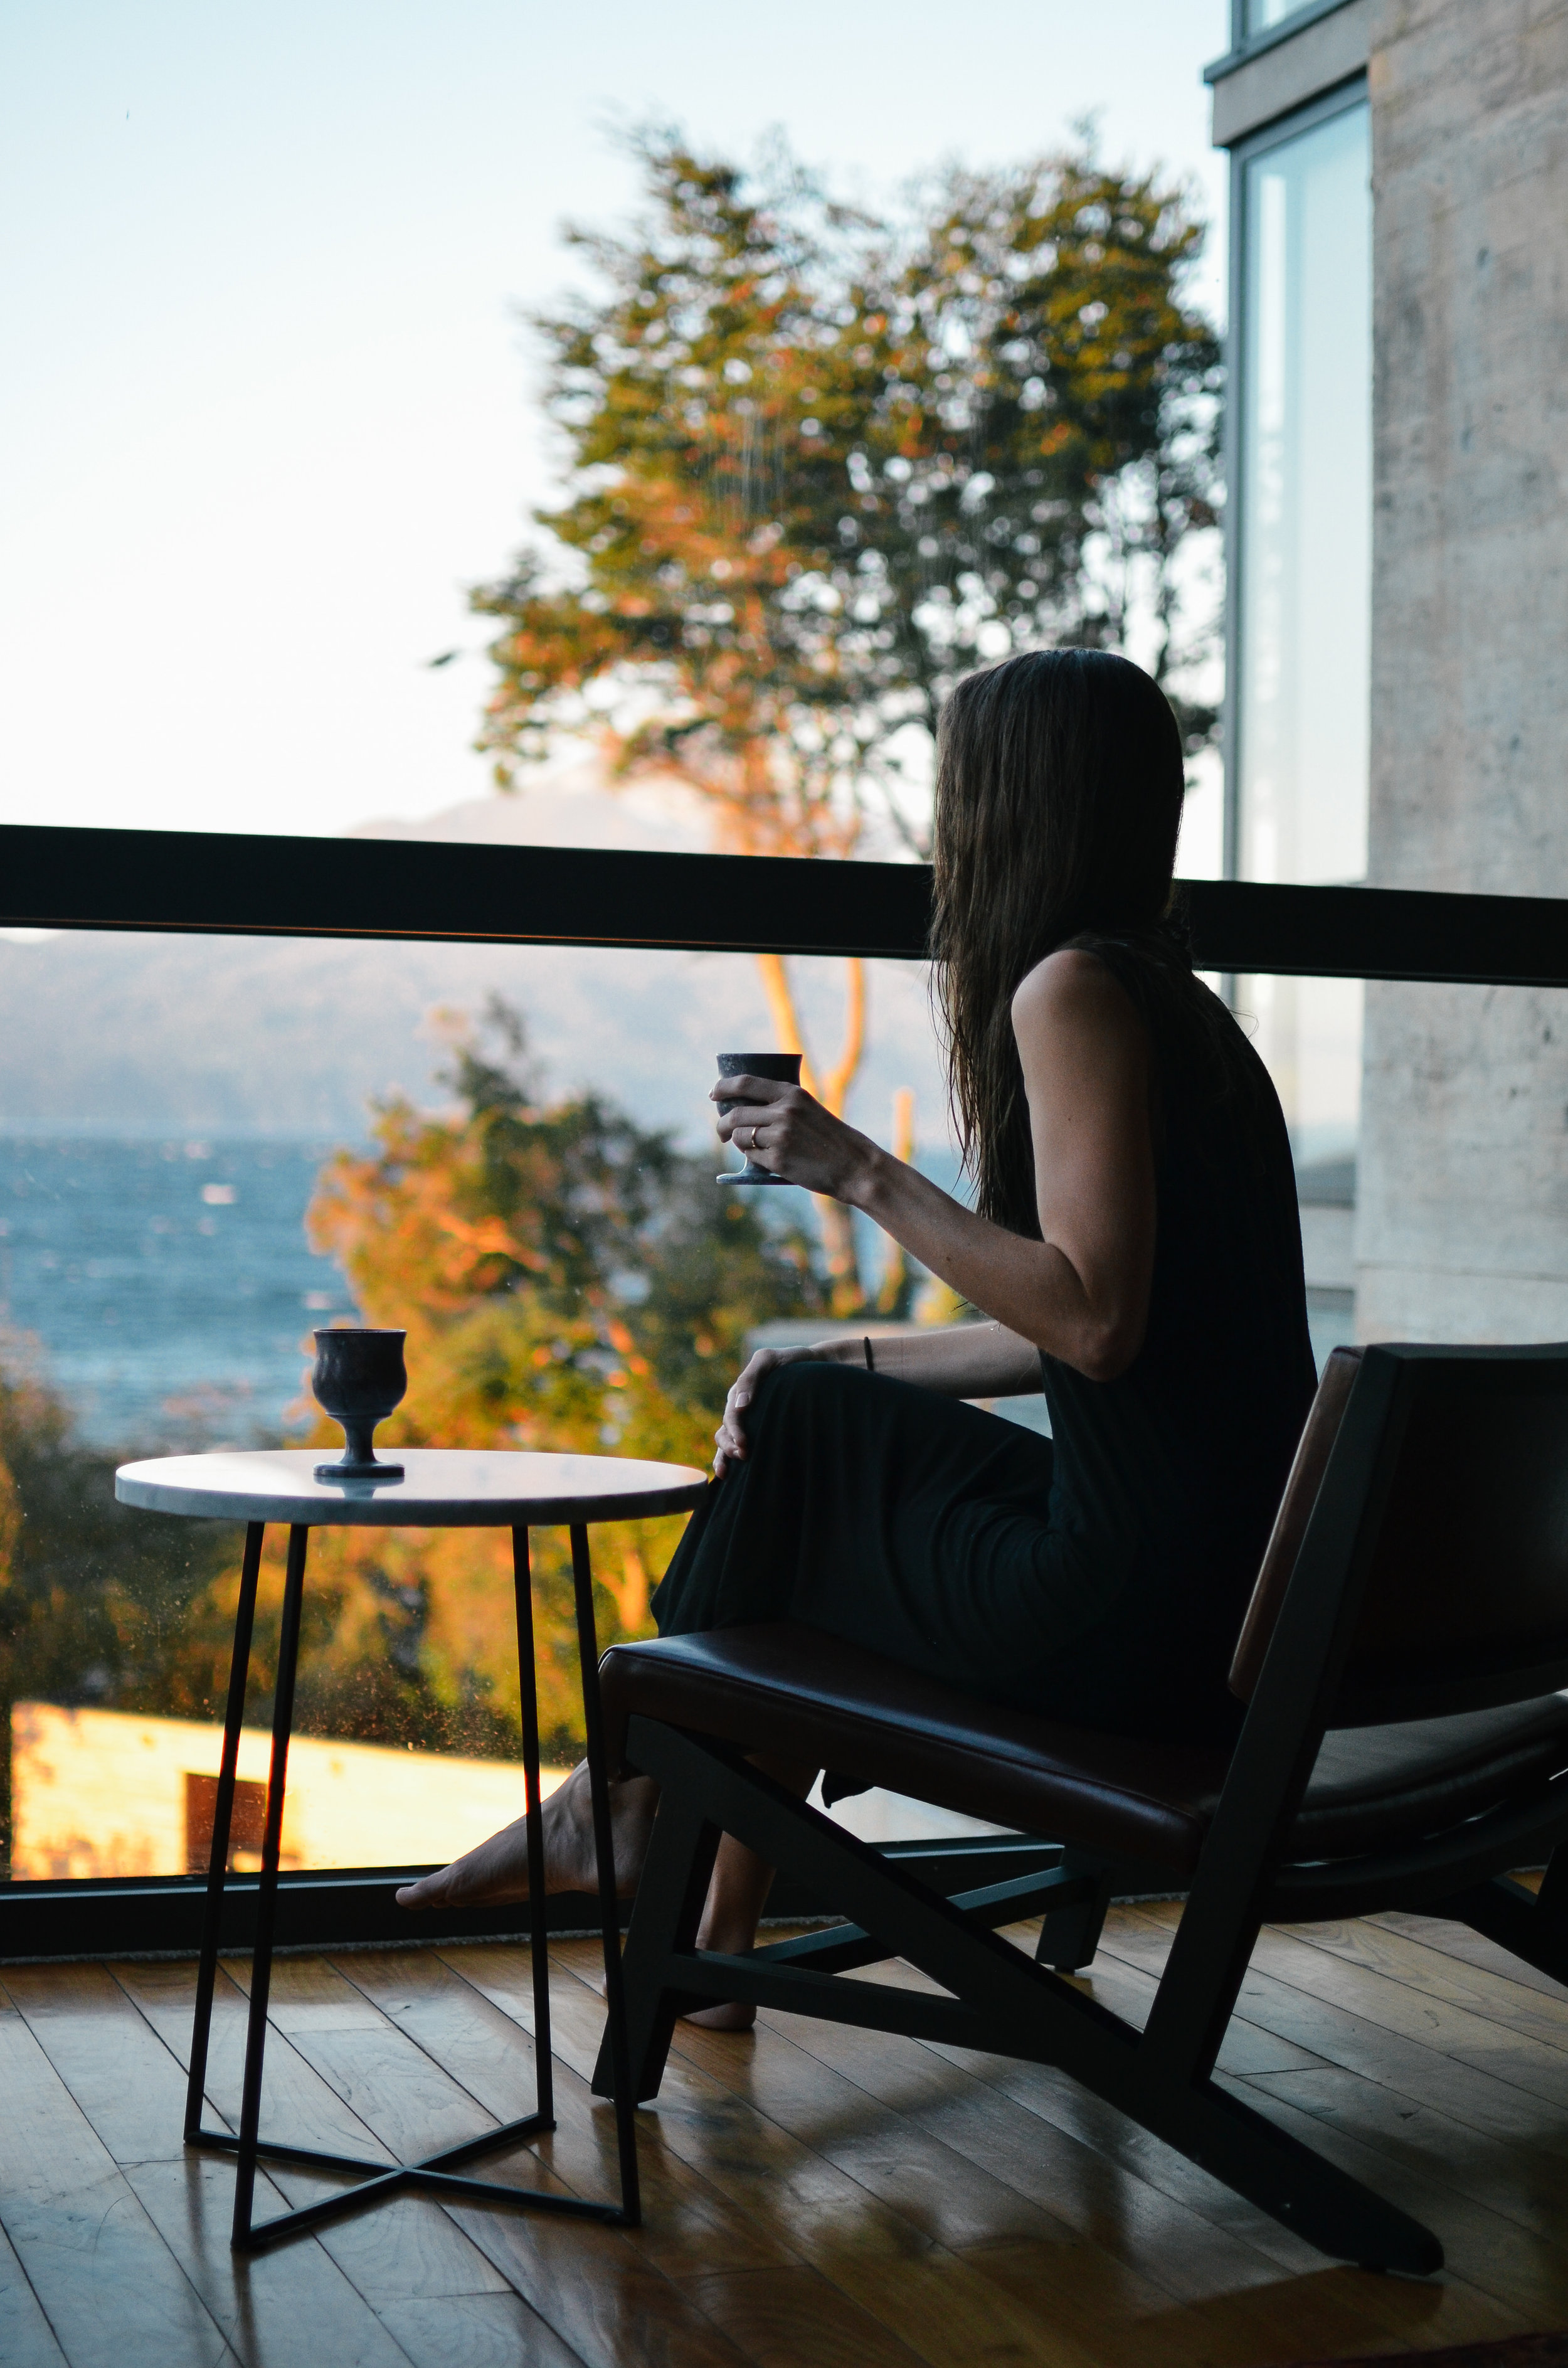 chile+awa+hotel+travel+guide+life+on+pine_DSC_1169.jpg